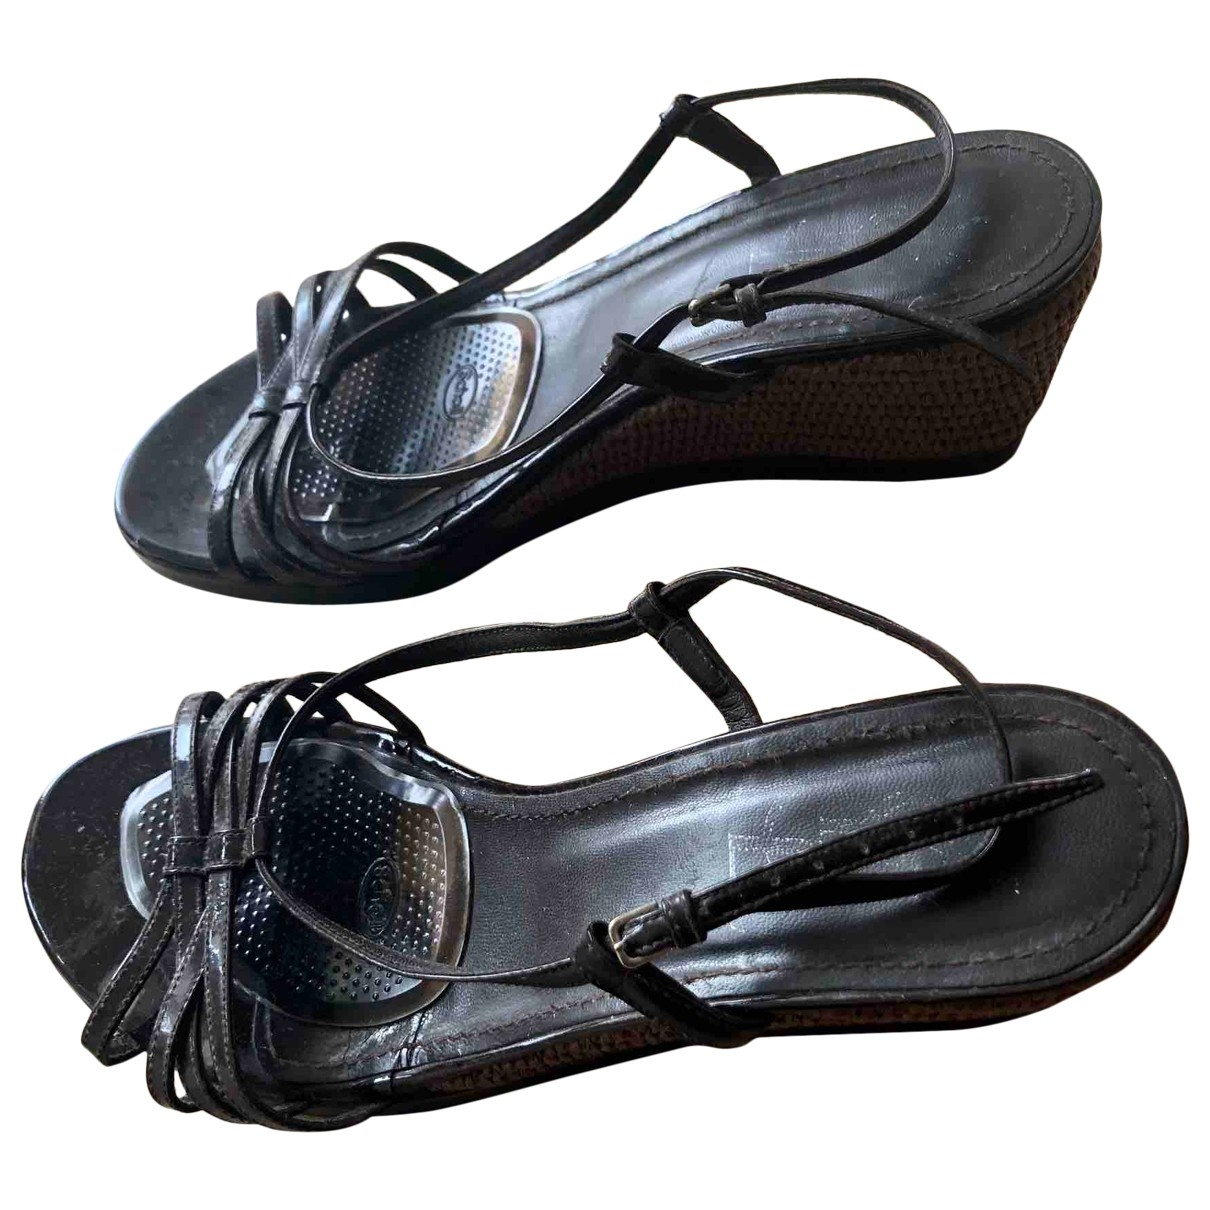 Yves Saint Laurent \N Brown Leather Sandals for Women 41 EU